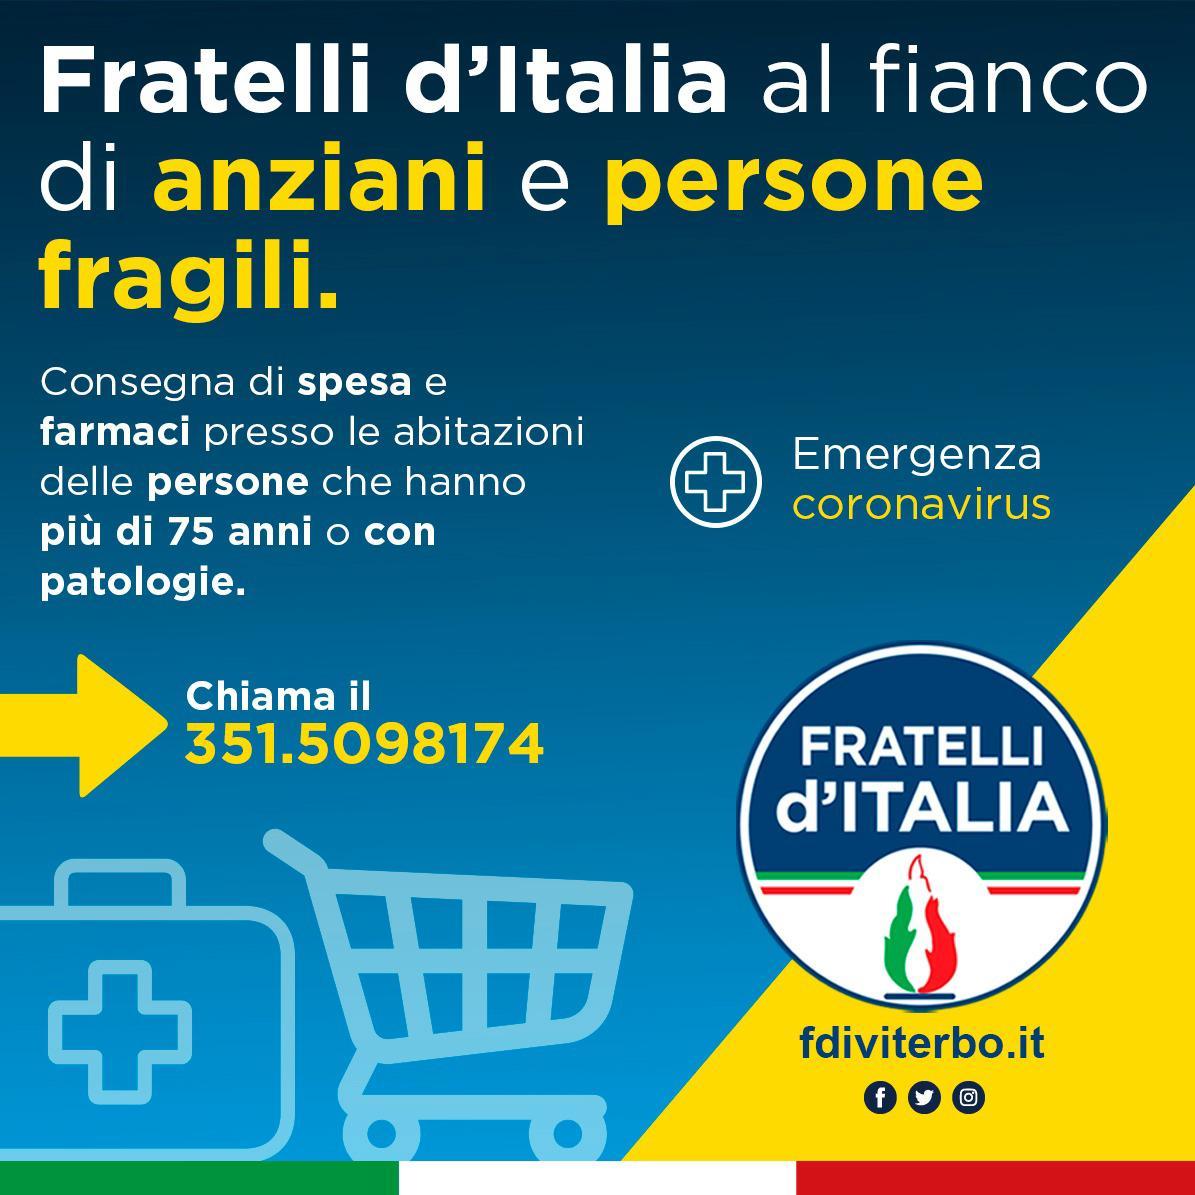 CORONAVIRUS, FRATELLI D'ITALIA ISTITUISCE NUMERO TELEFONICO PER GLI AIUTI